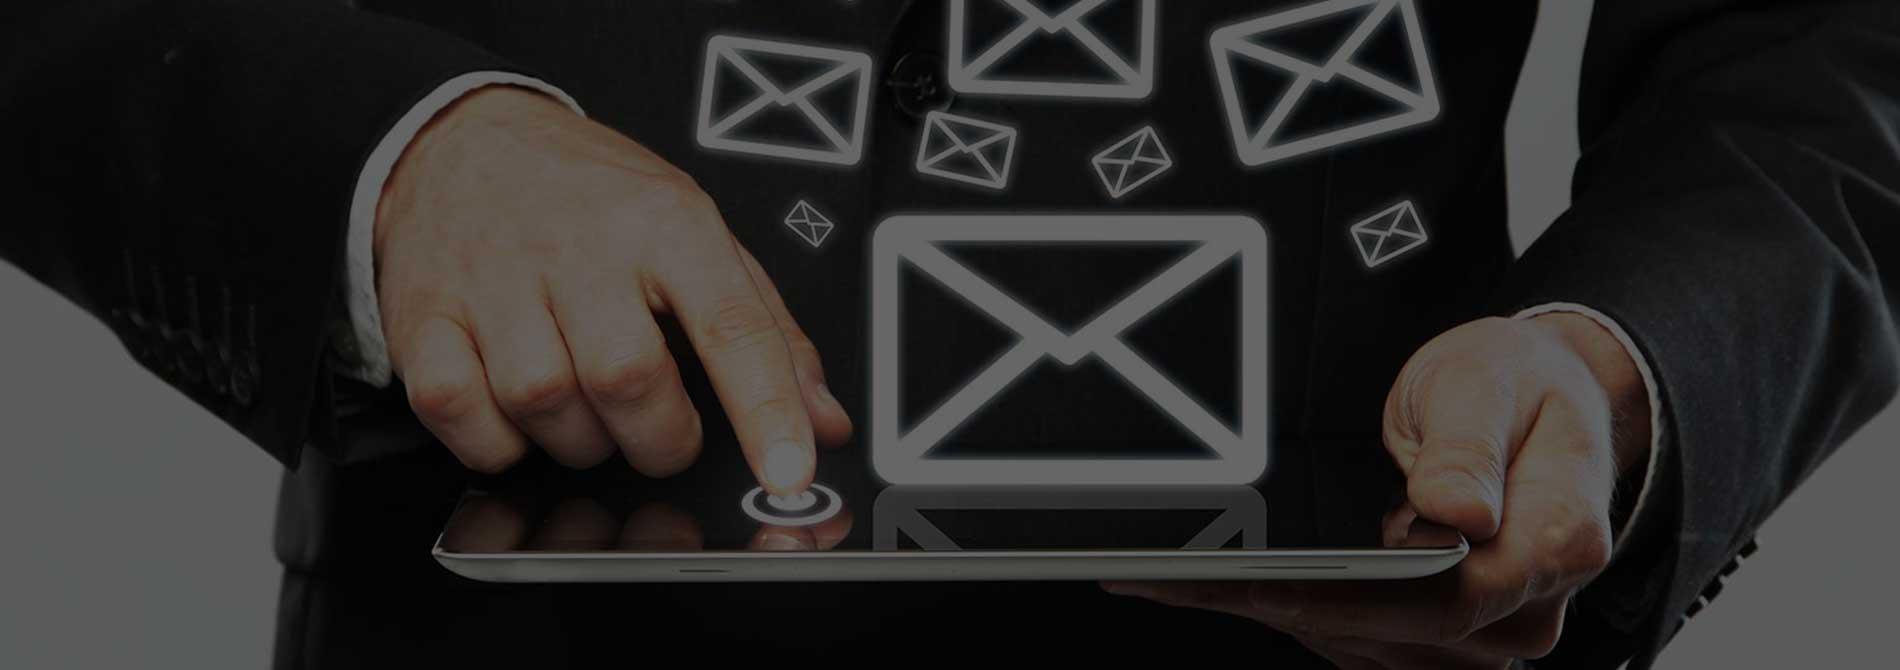 Banner Mail Marketing Convex